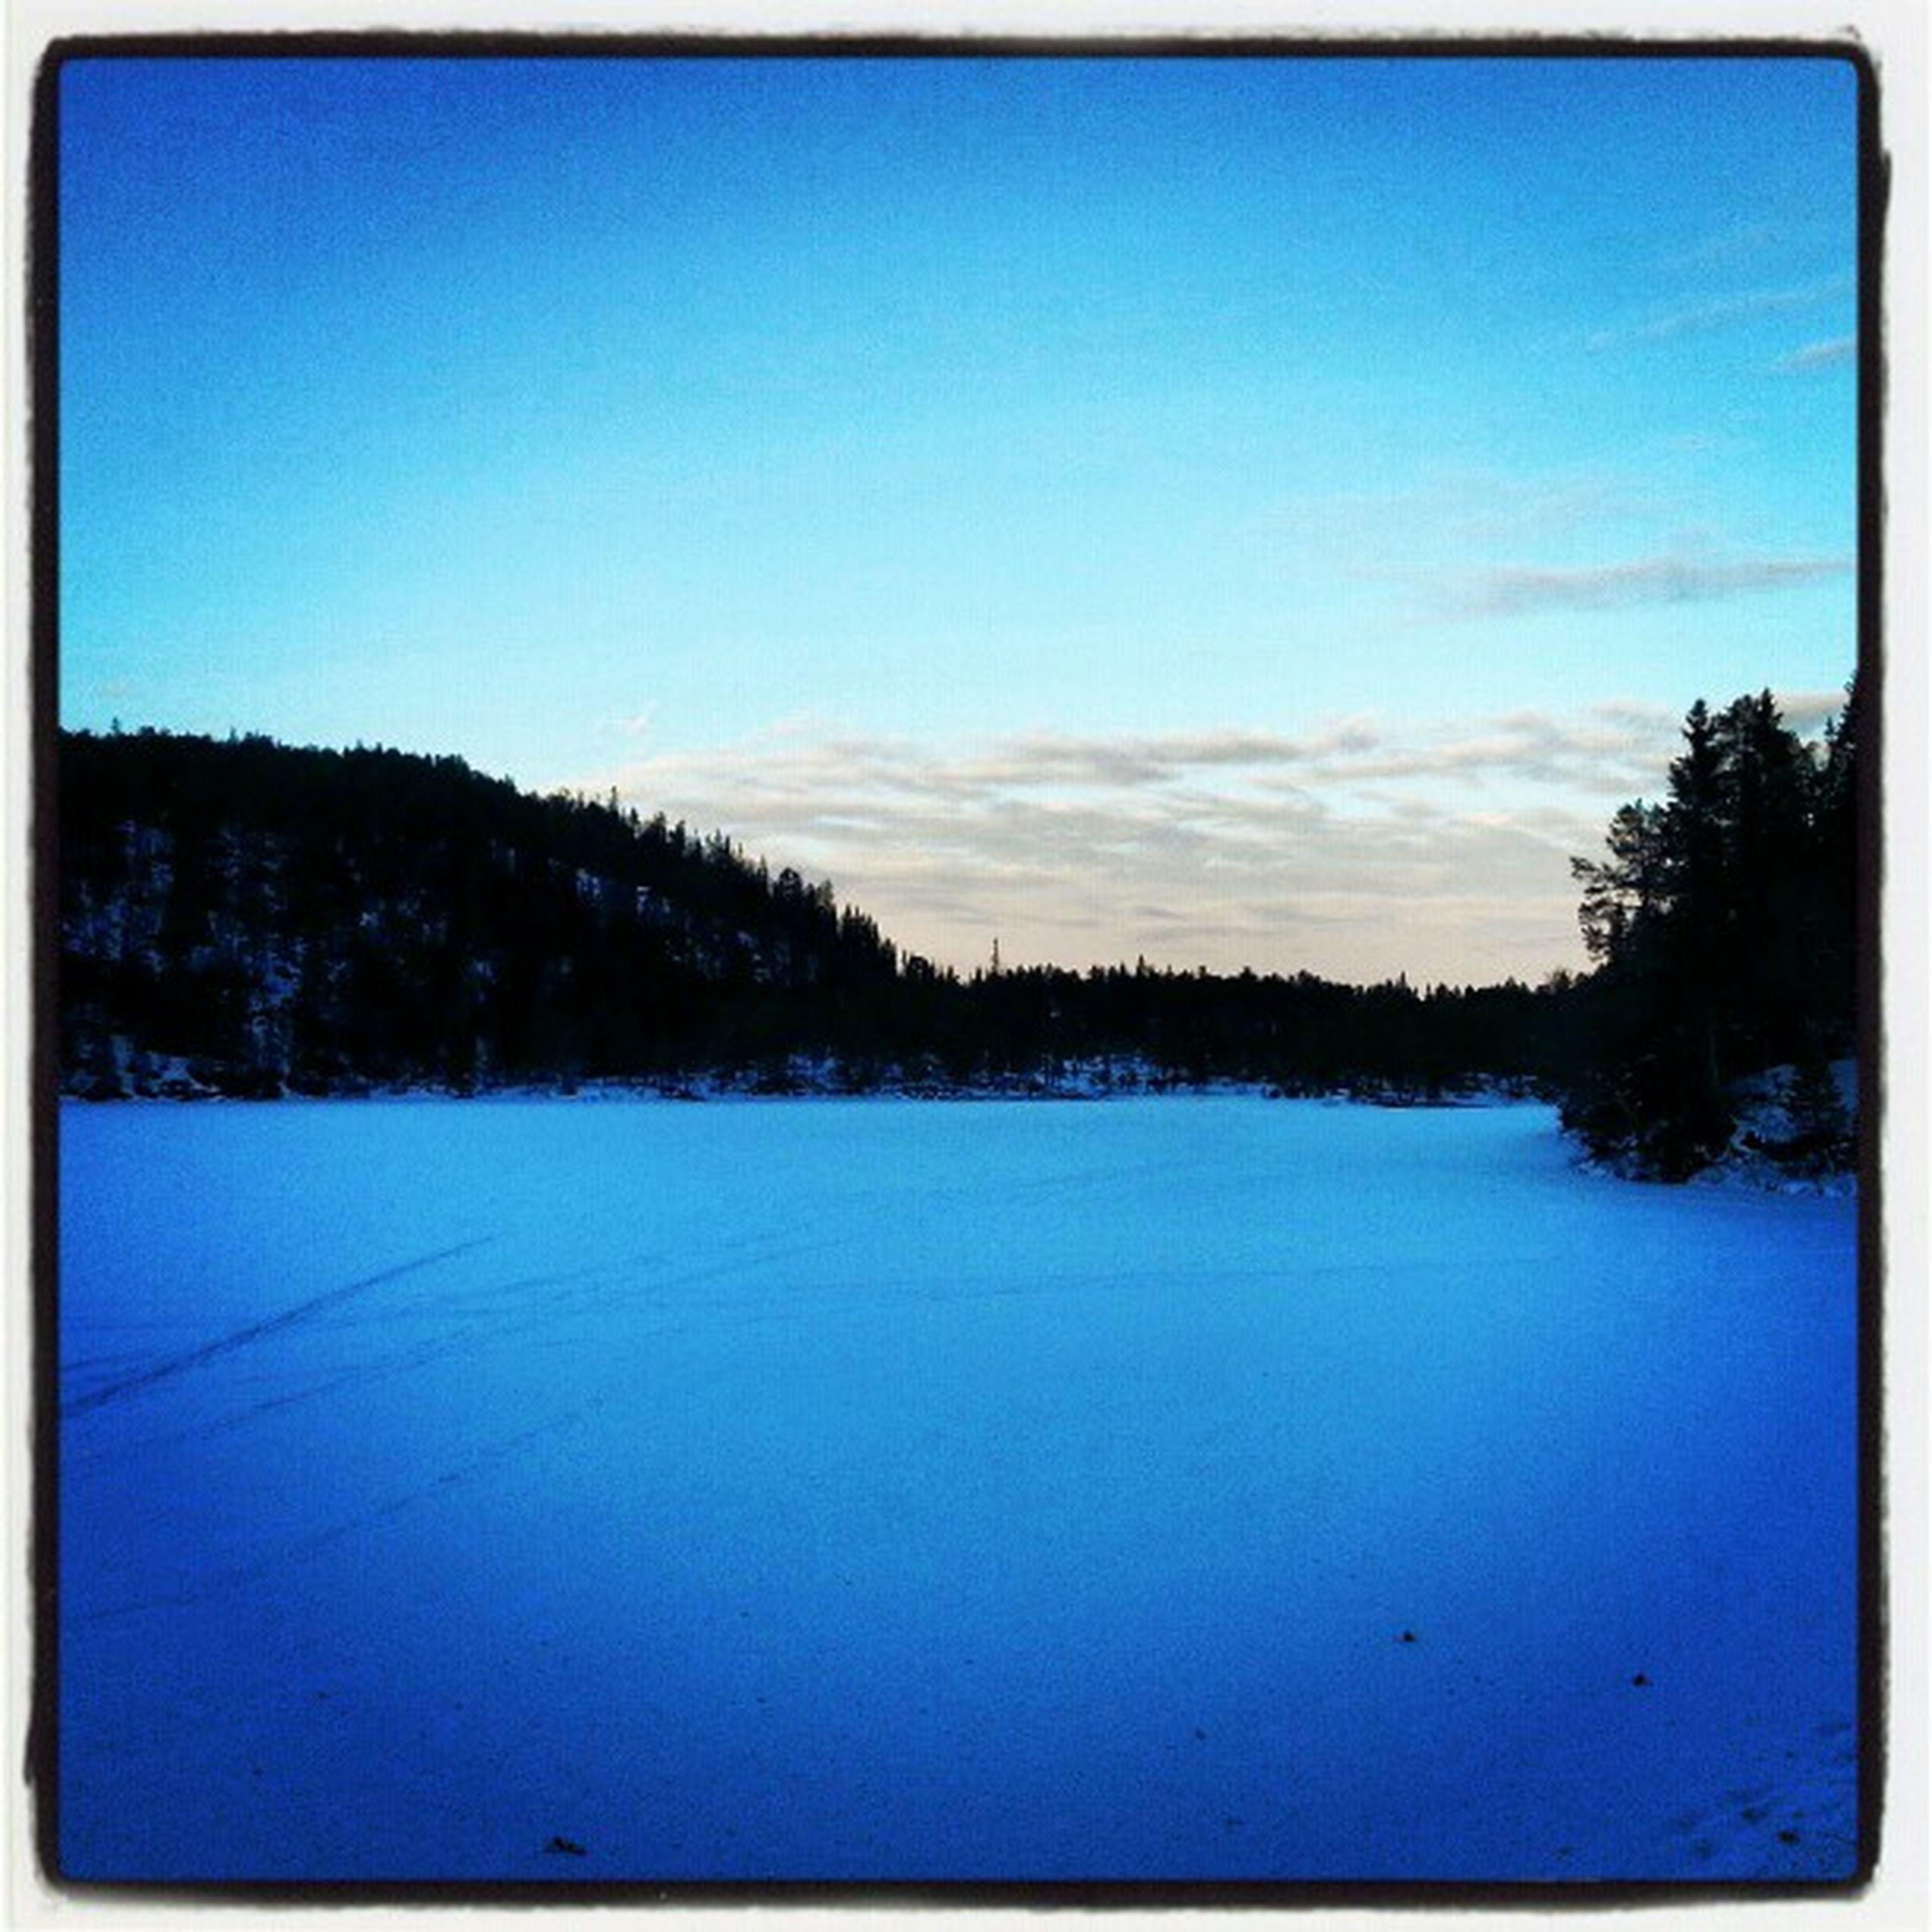 #frozen #lake #winter #december #kobberdammen #sky #clouds Clouds Sky Winter Frozen December Lake Kobberdammen